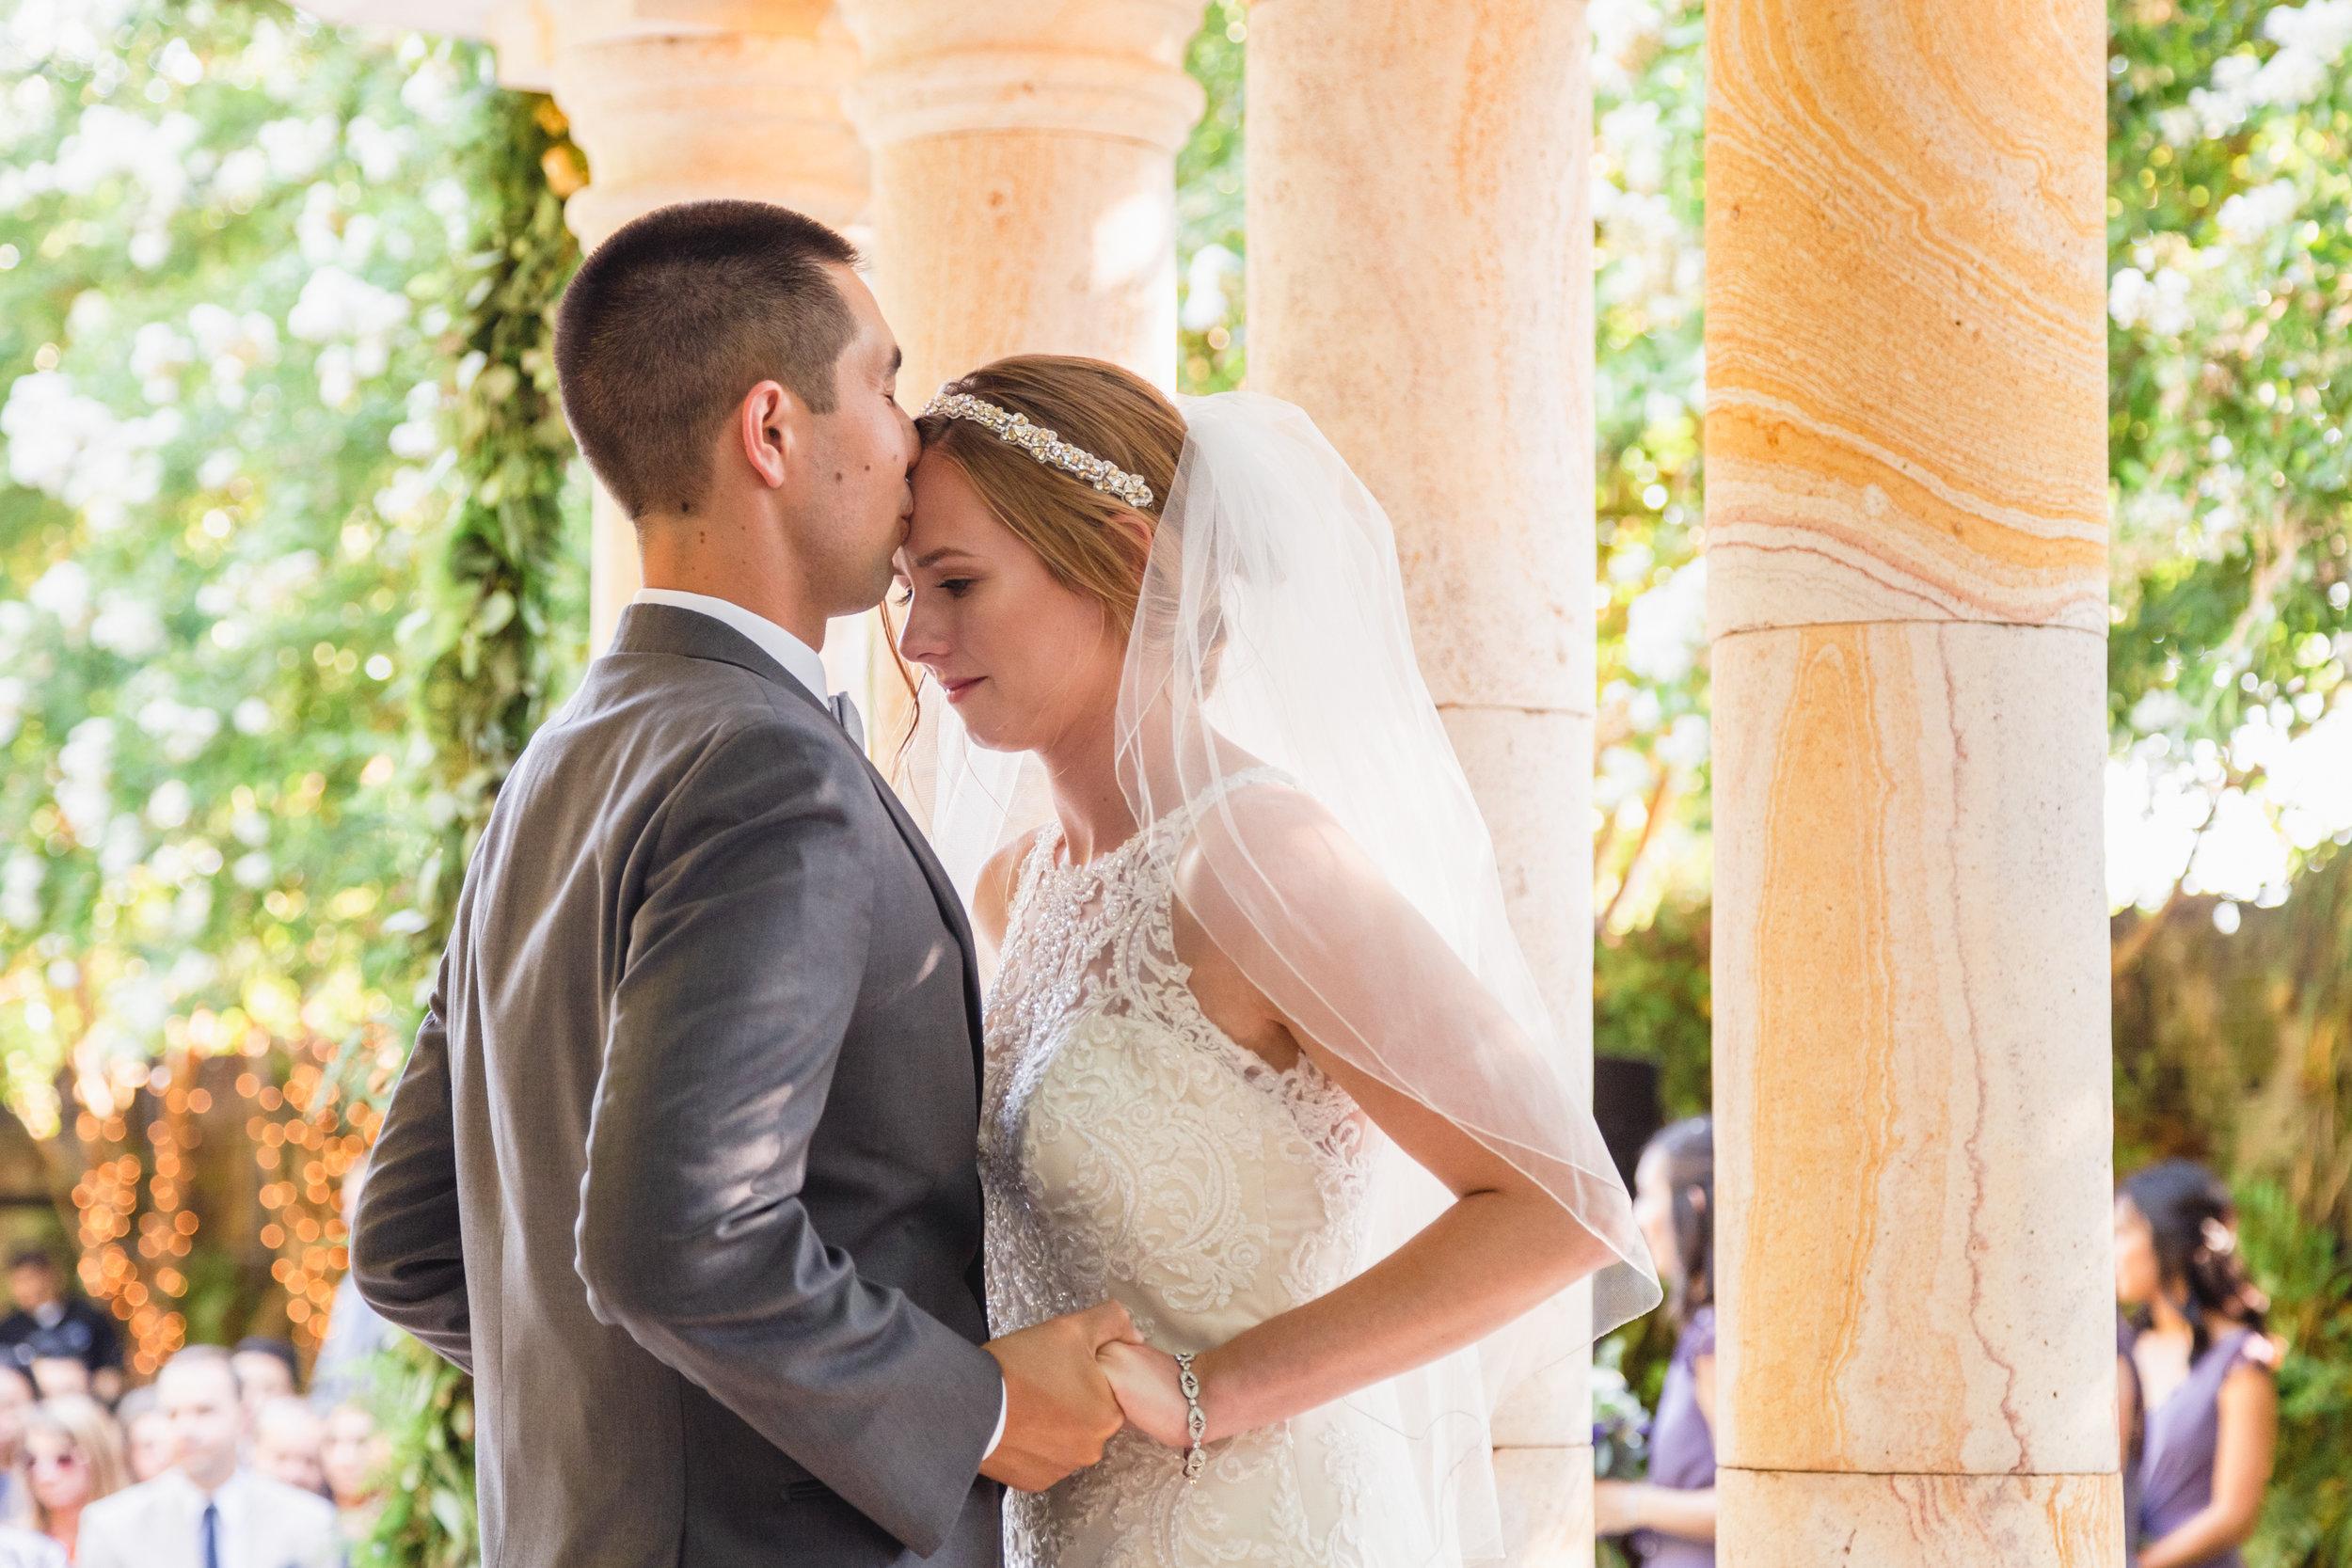 rebeccaylasotras-bay-area-garden-wedding-40.jpg